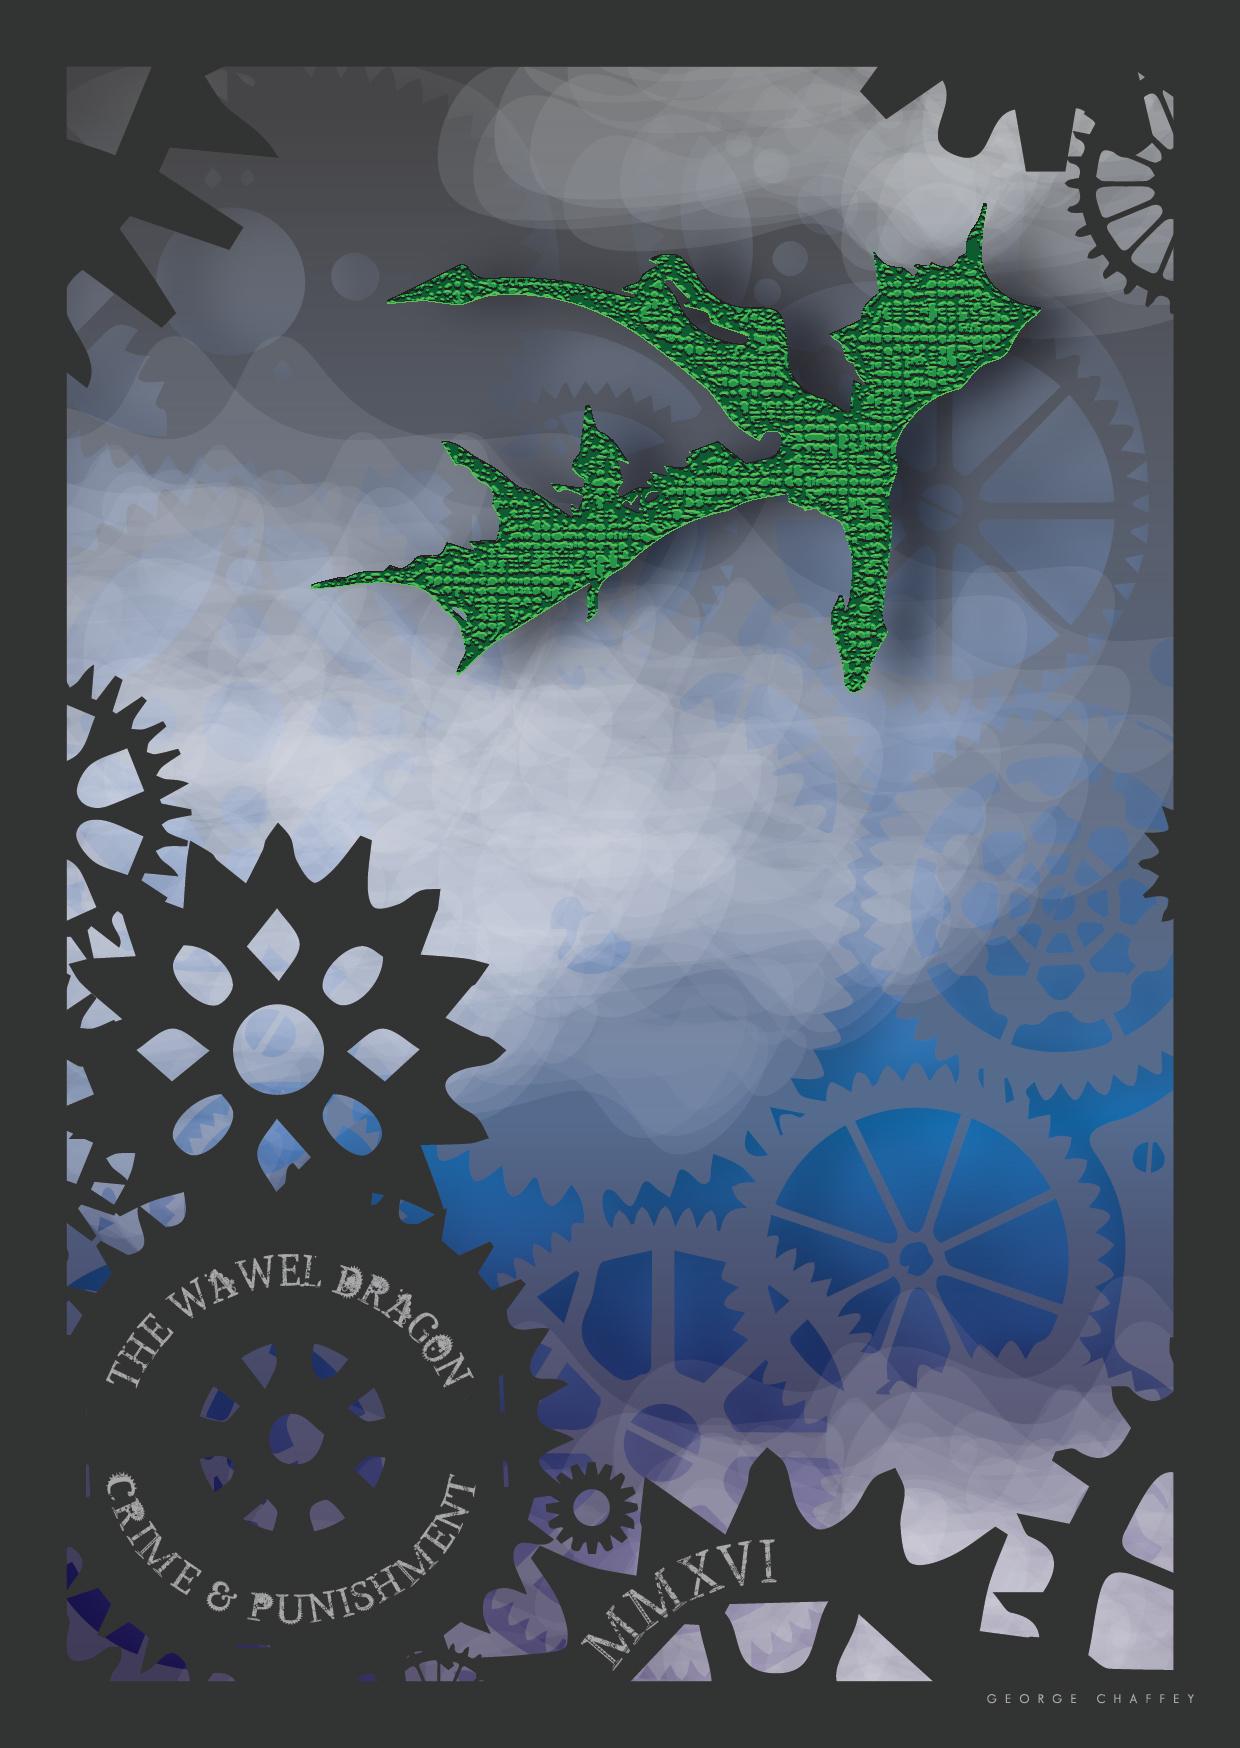 The Wawel Dragon/Crime & Punishment